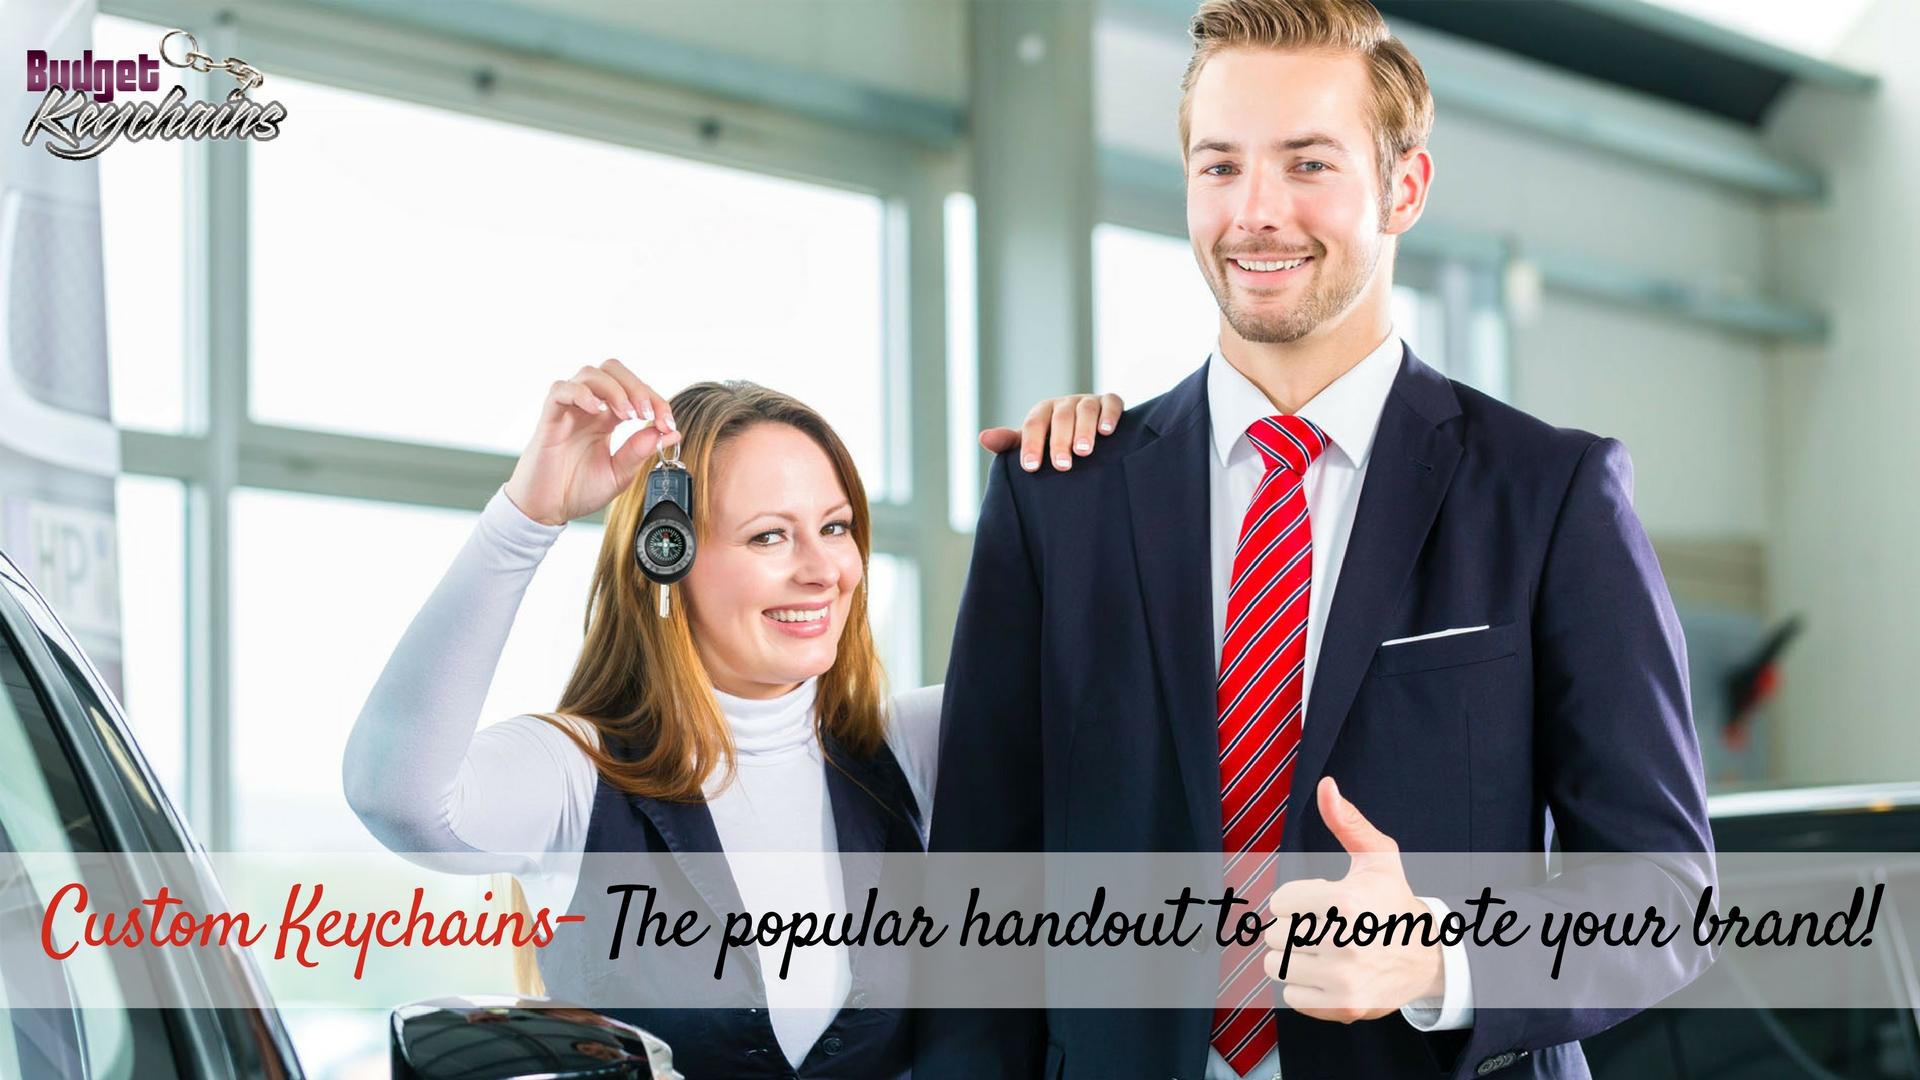 custom-keychains-popularHandout-promote